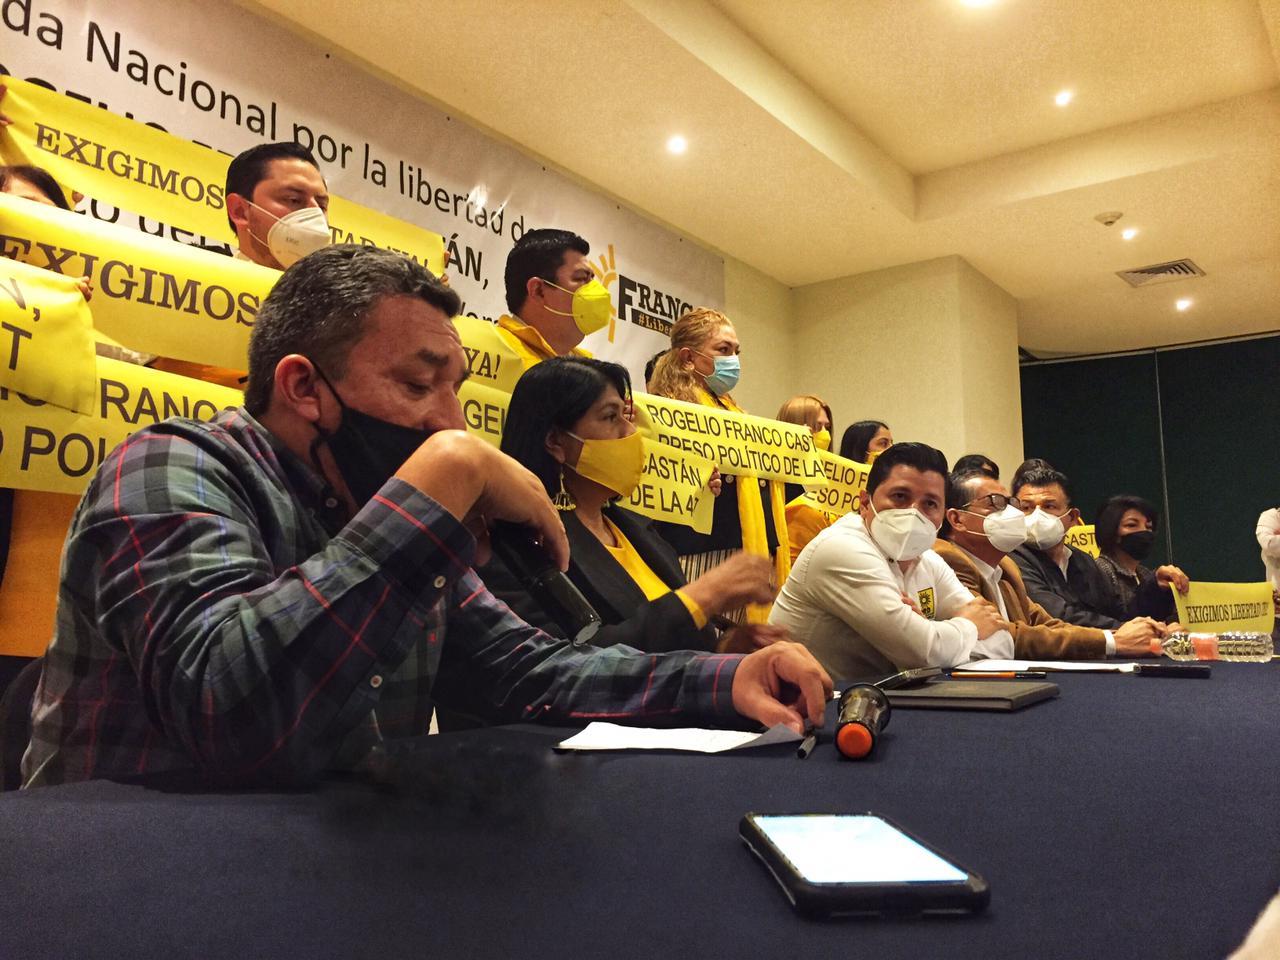 Inicia PRD jornada nacional por la libertad de Rogelio Franco